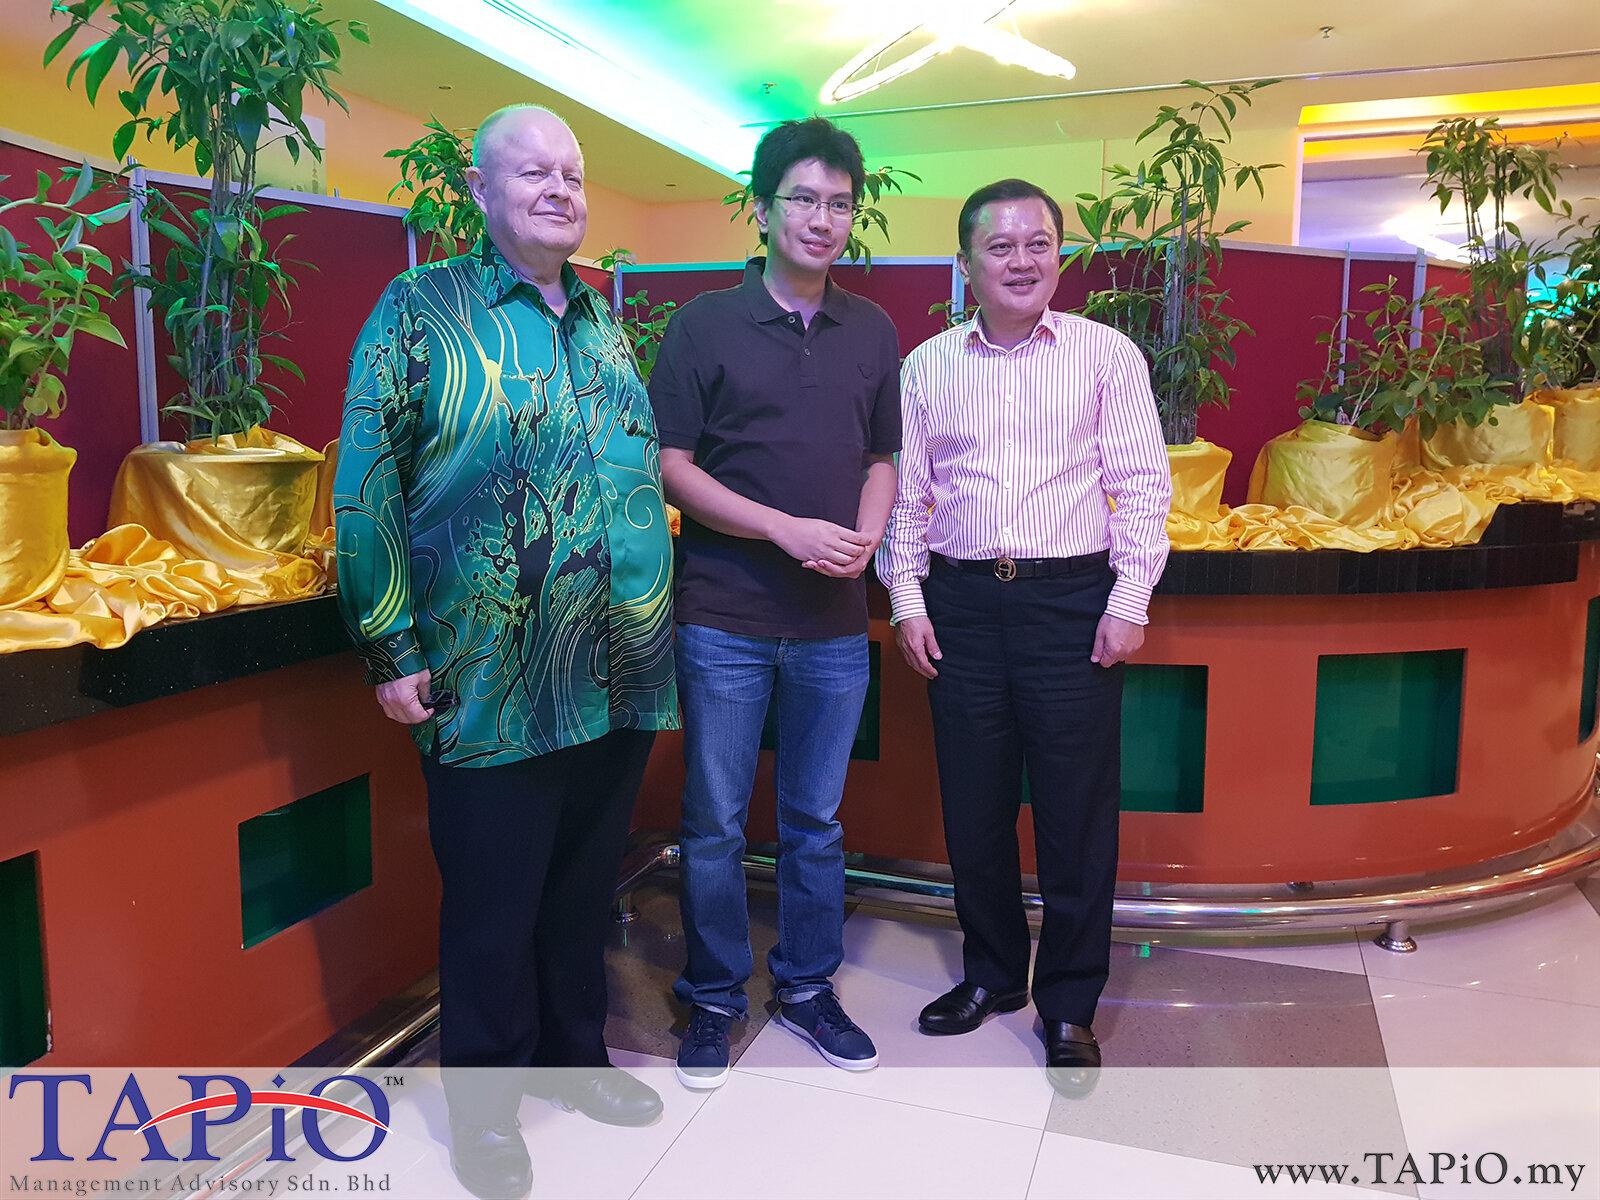 20200209 - Dinner with Tunku Zain